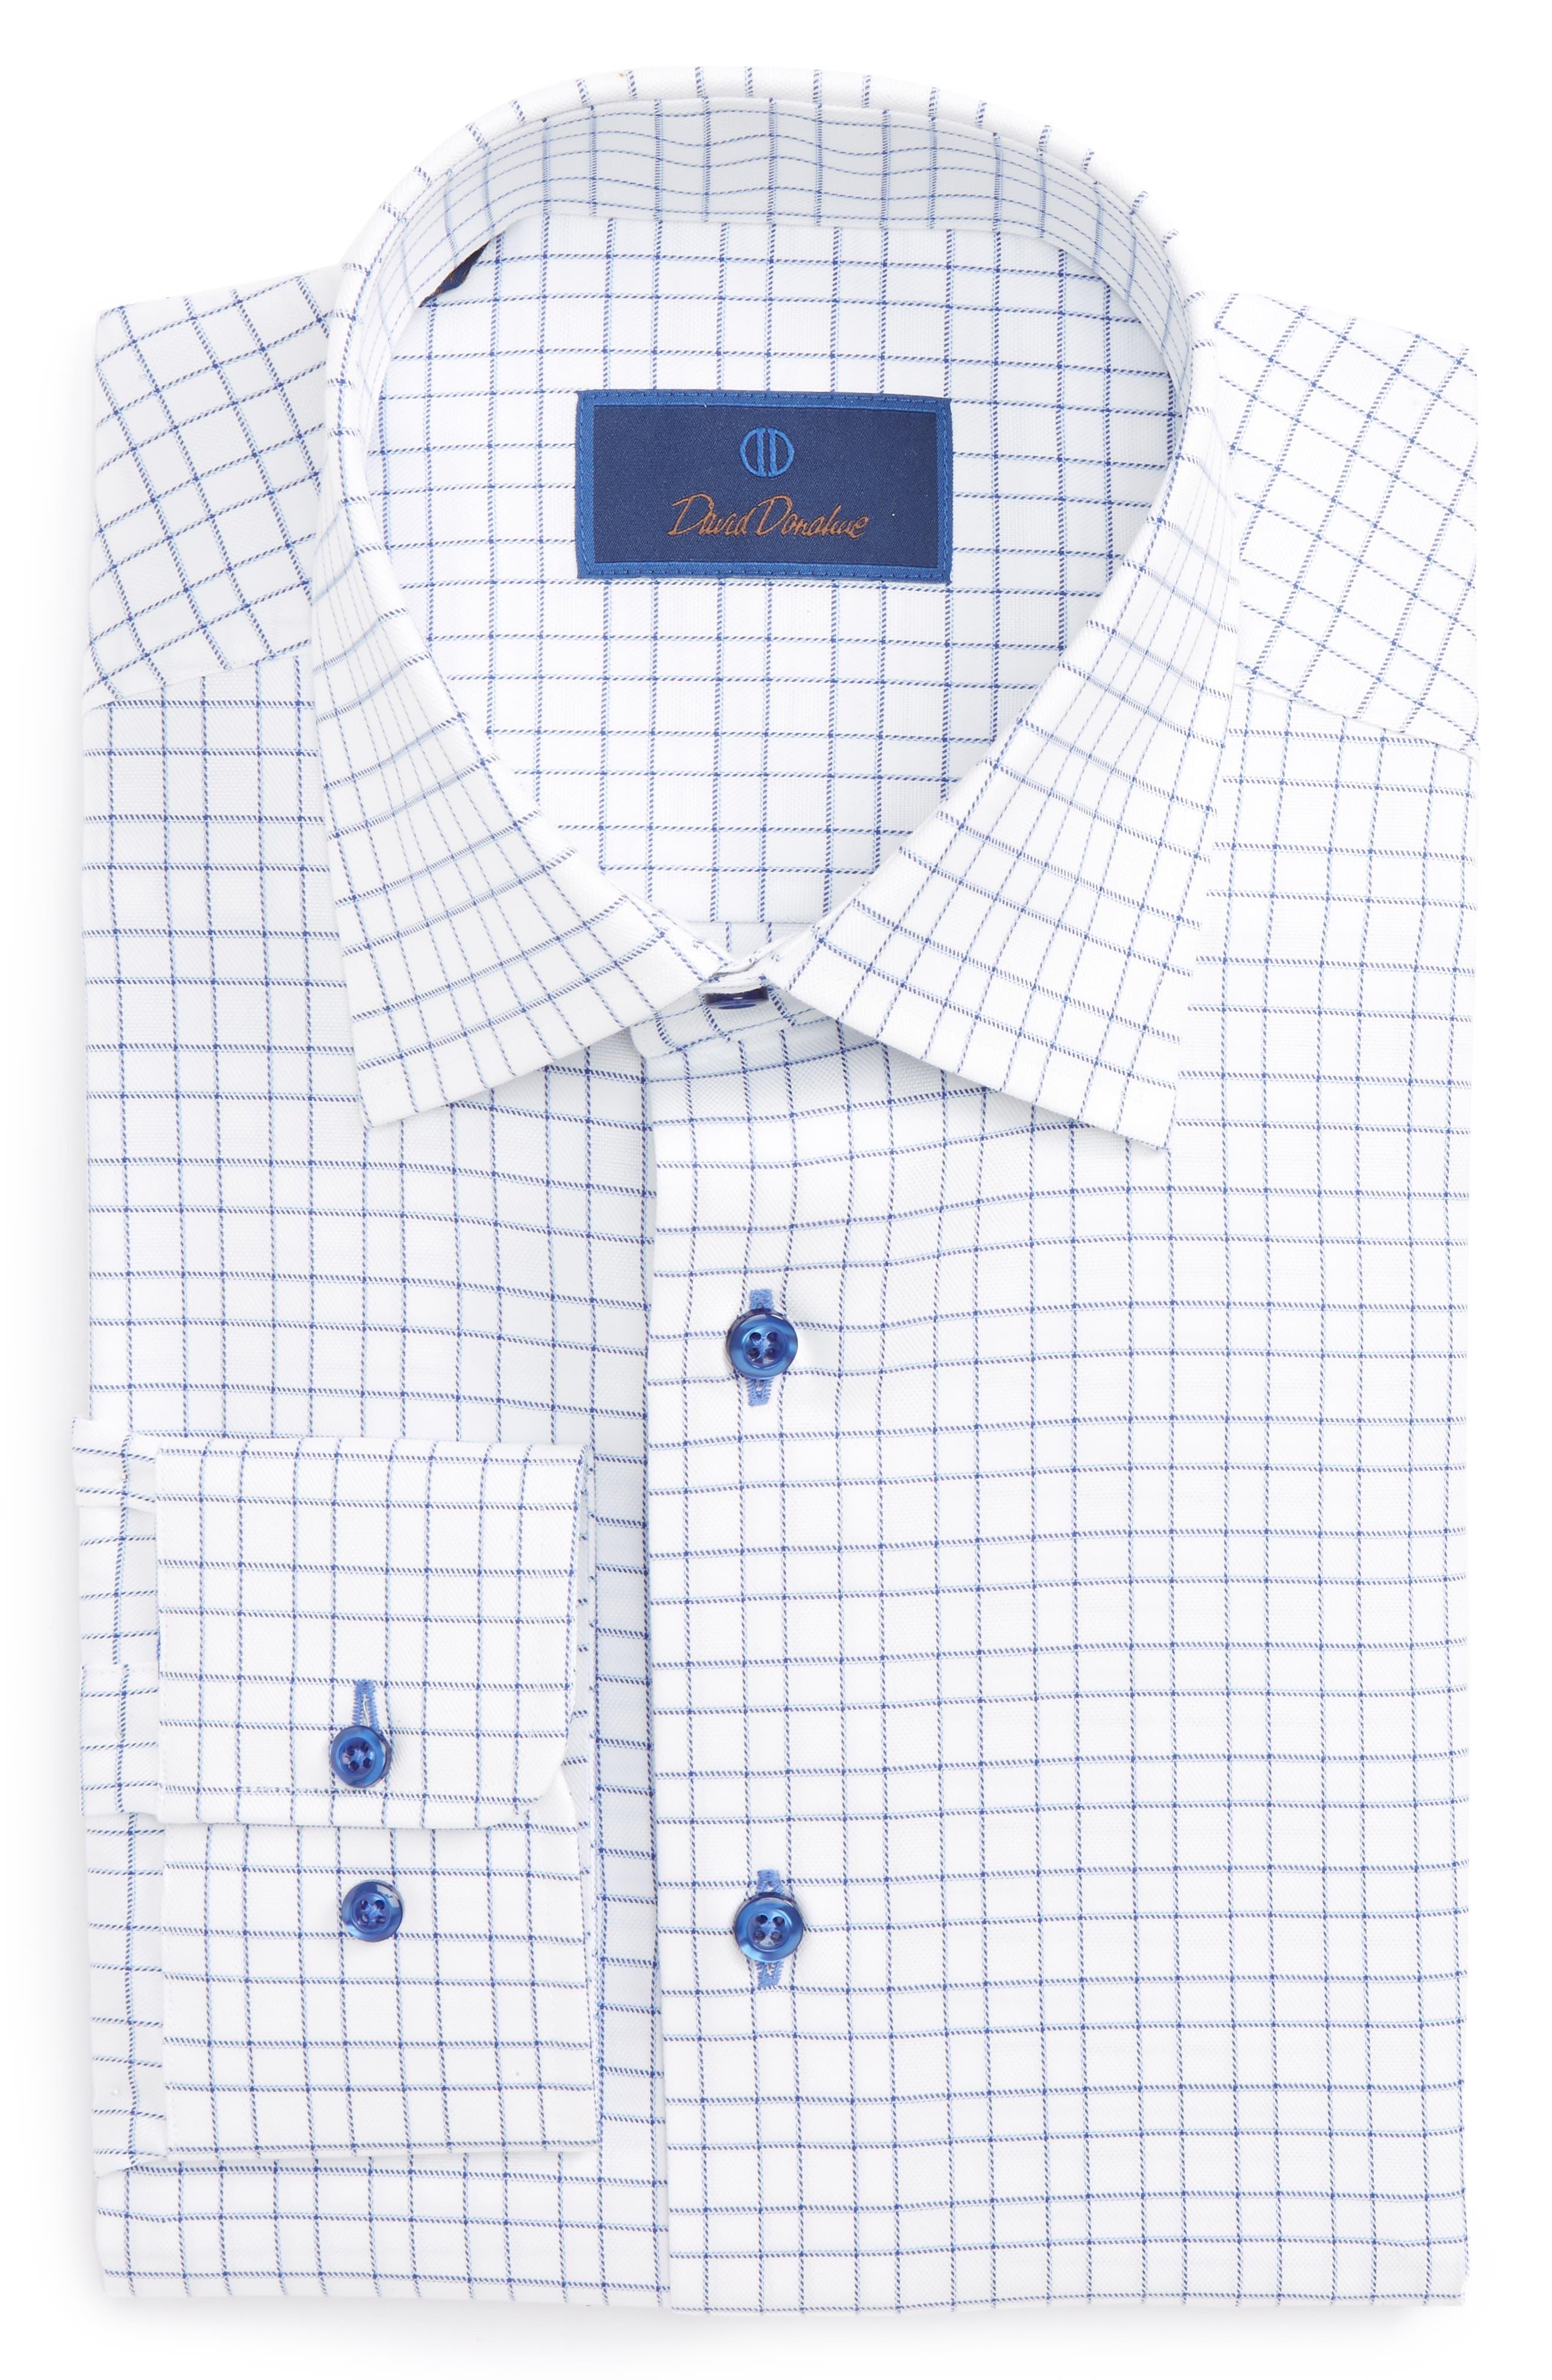 Regular Fit Dress Shirt,                             Main thumbnail 1, color,                             423